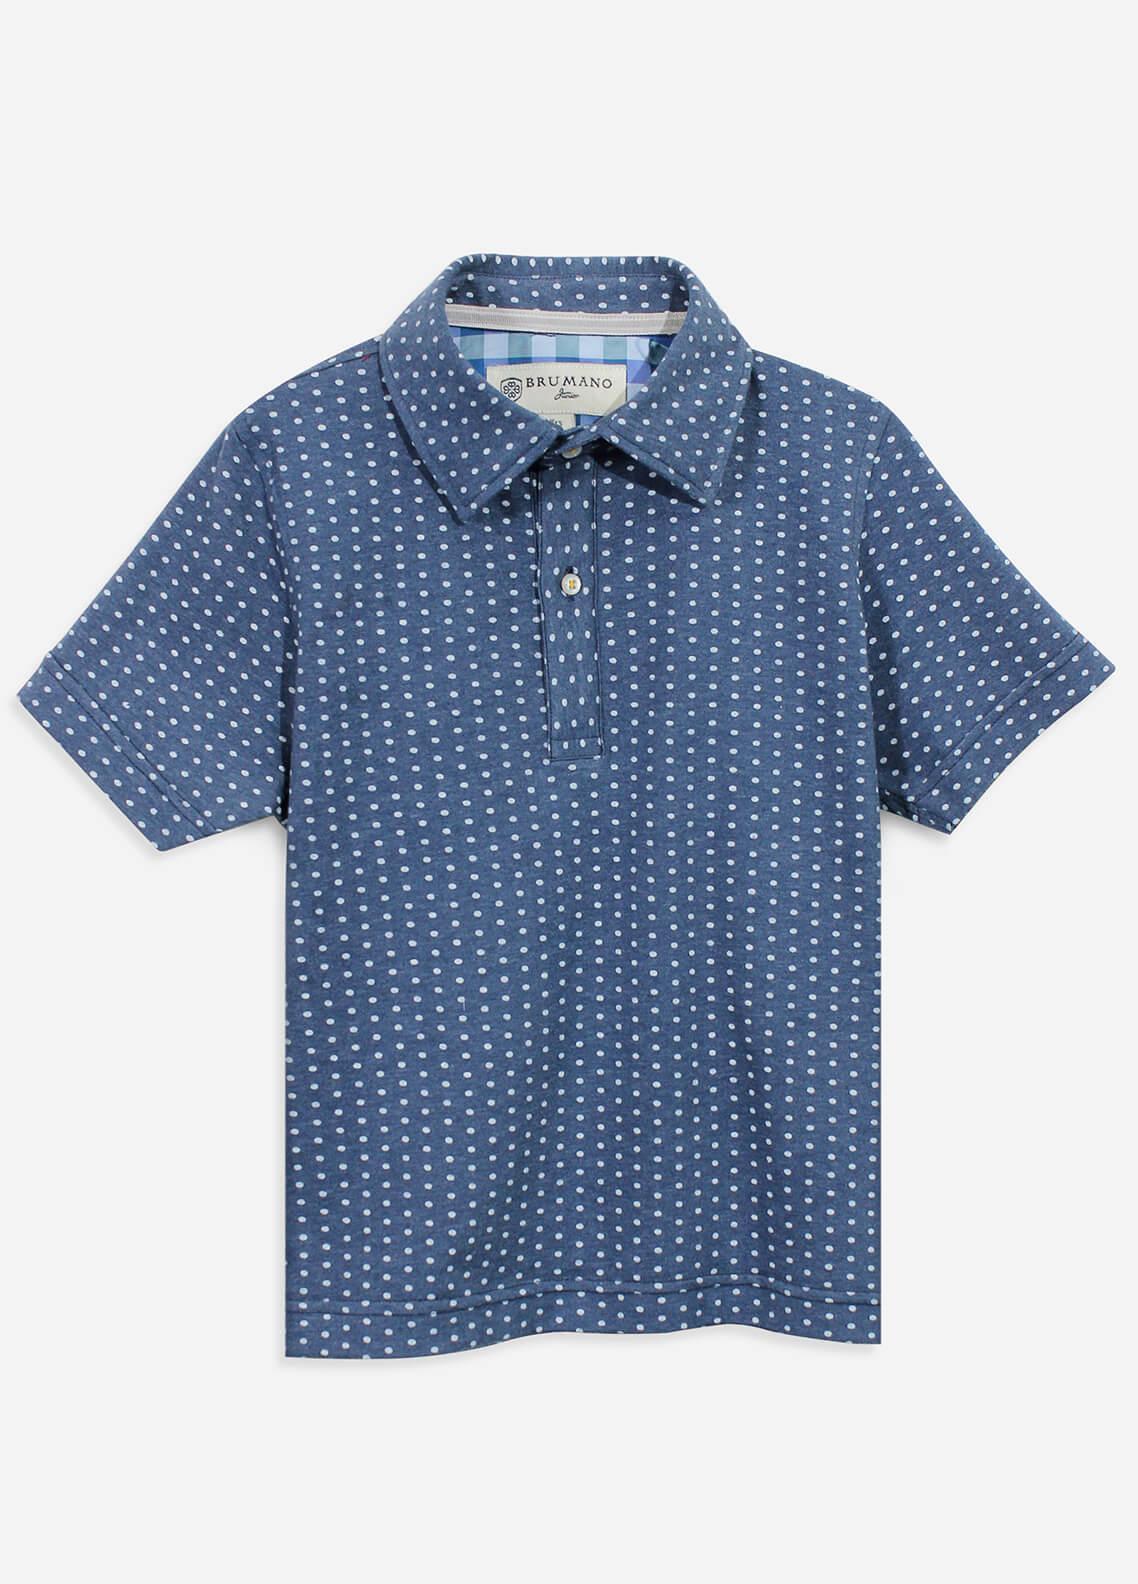 Brumano Cotton Polo Boys Shirts - Blue BRM-082